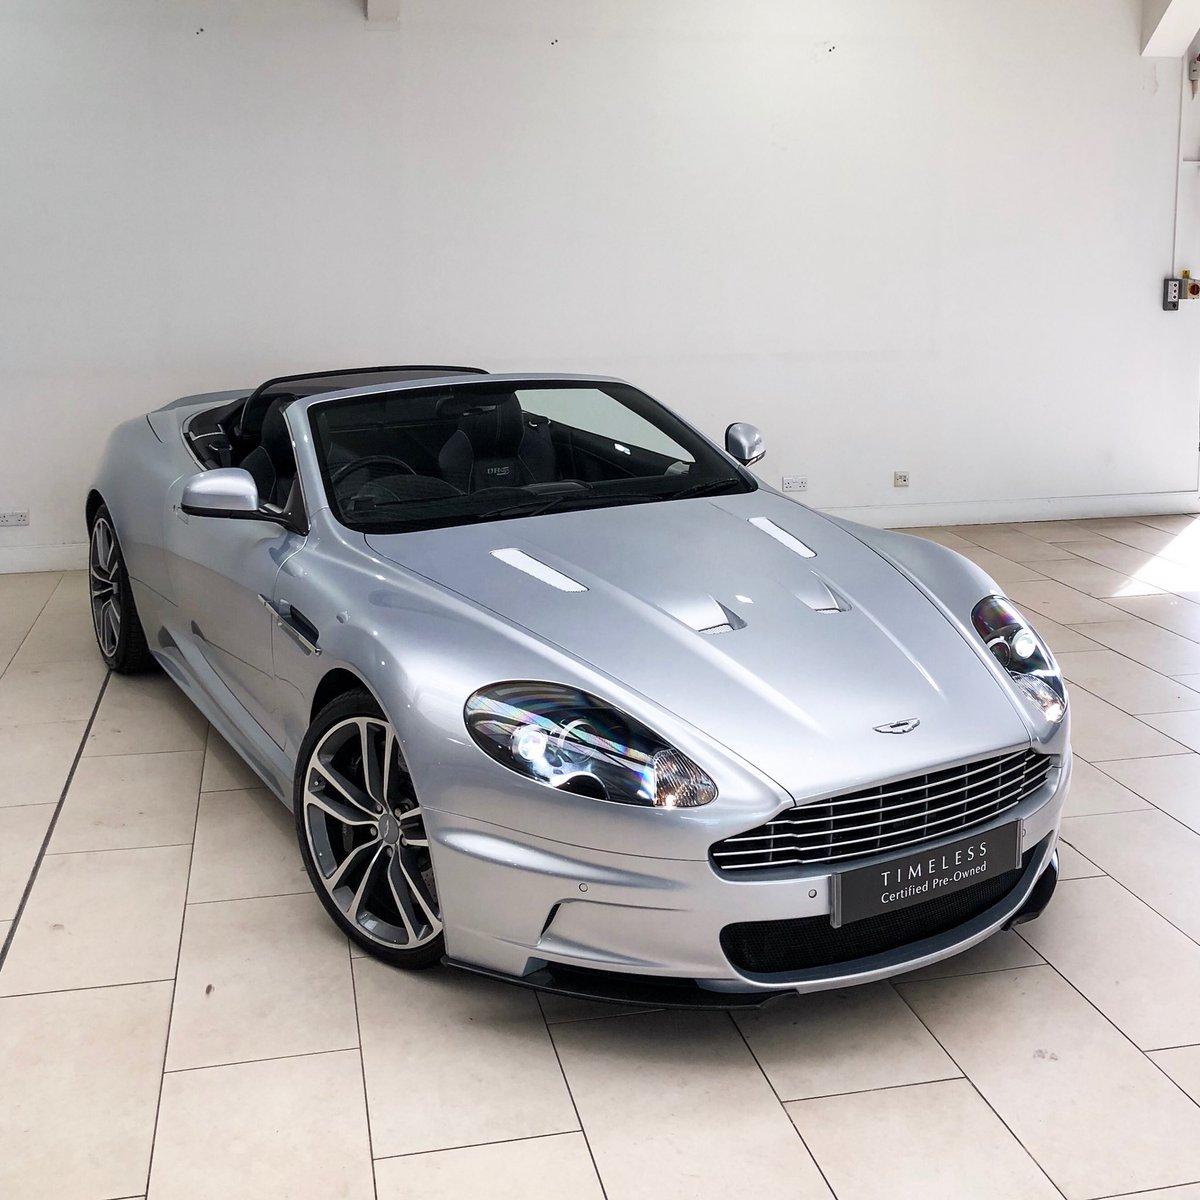 Aston Martin Edinburgh on